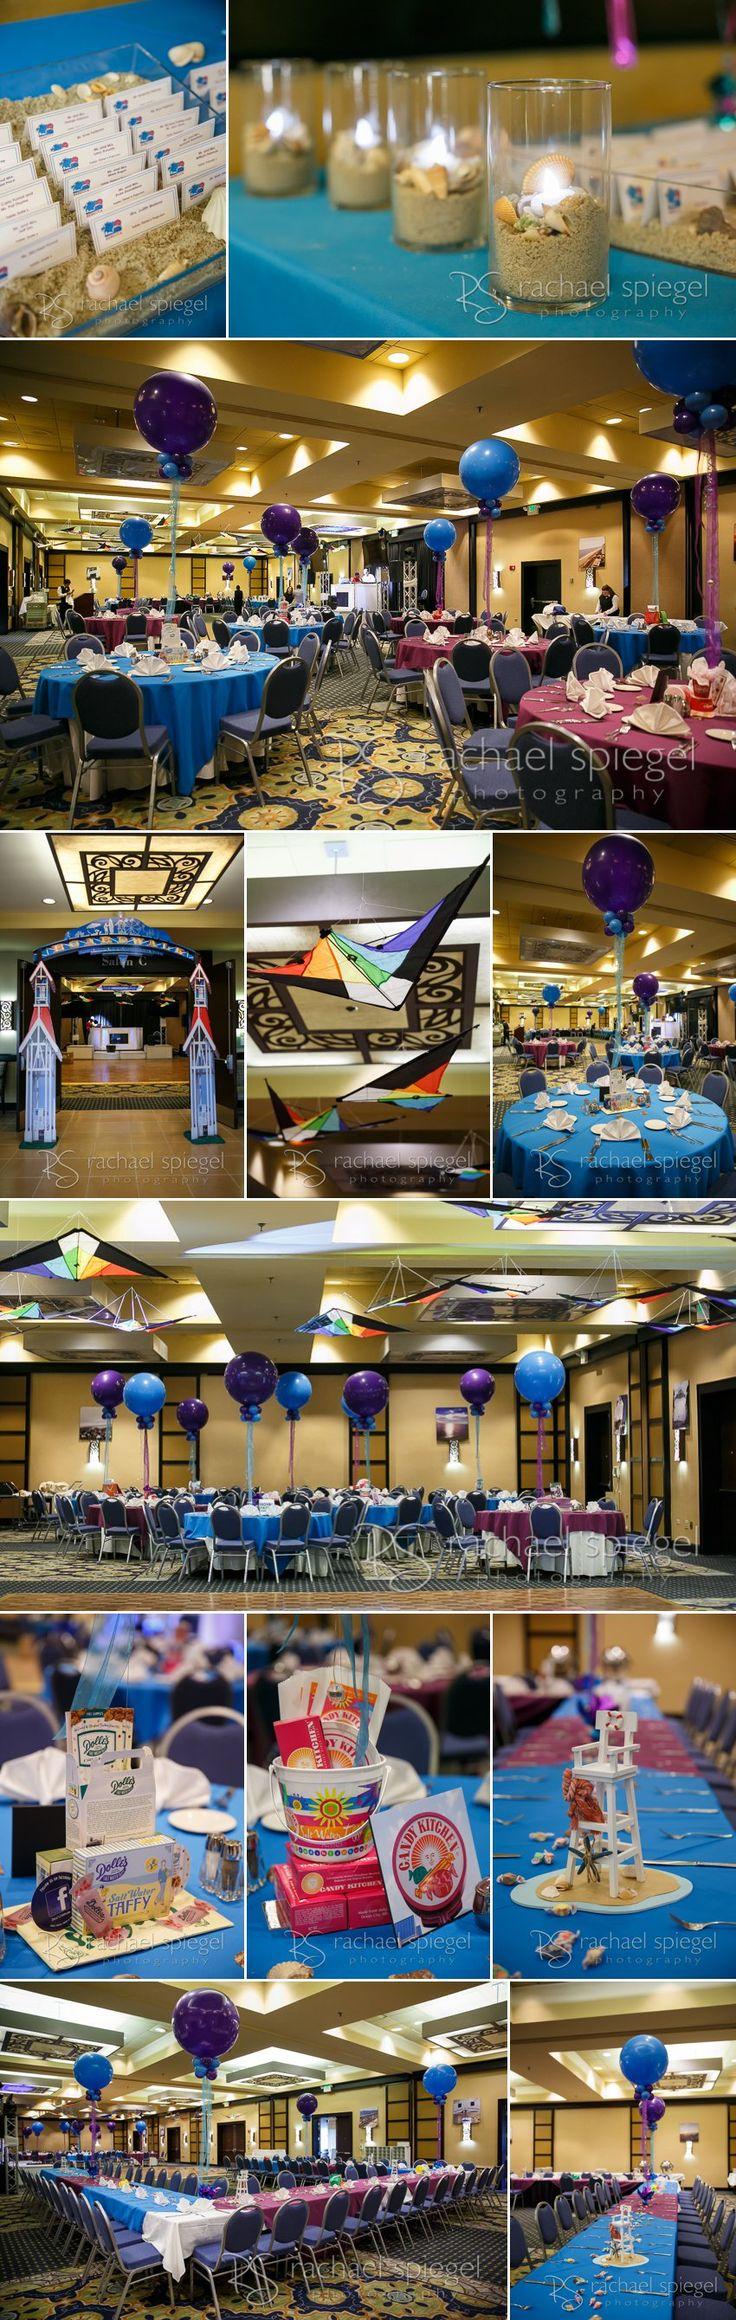 R's Bat Mitzvah Party – Gaithersburg Hilton. Beach themed Bat Mitzvah. Photographs by Rachael Spiegel Photography